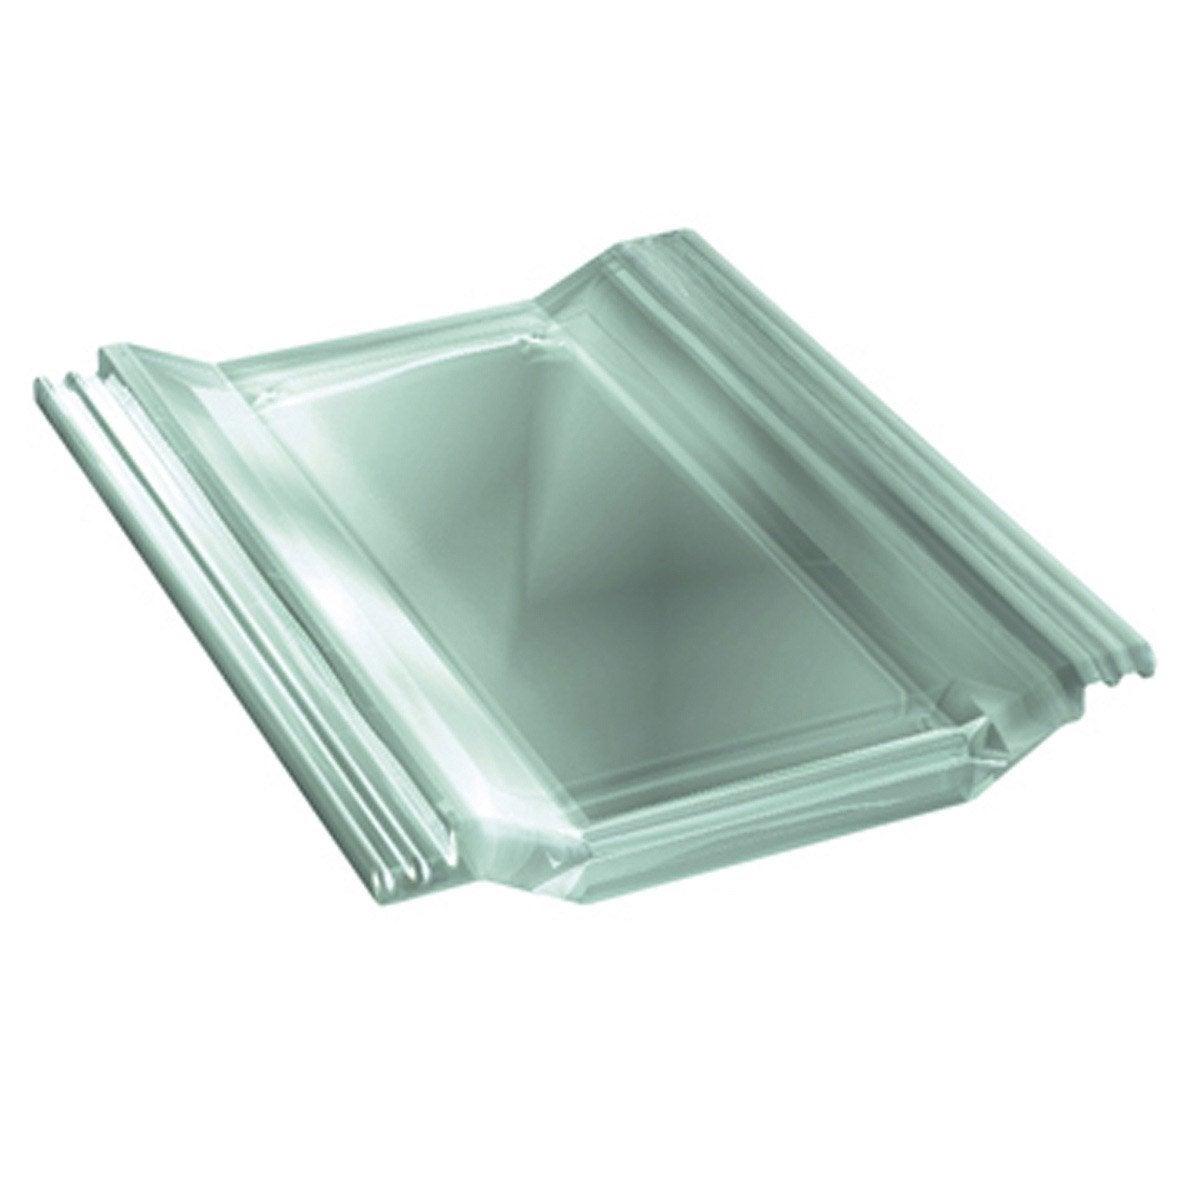 Tuile d 39 clairement monier translucide perspective leroy for Tole ondulee translucide leroy merlin